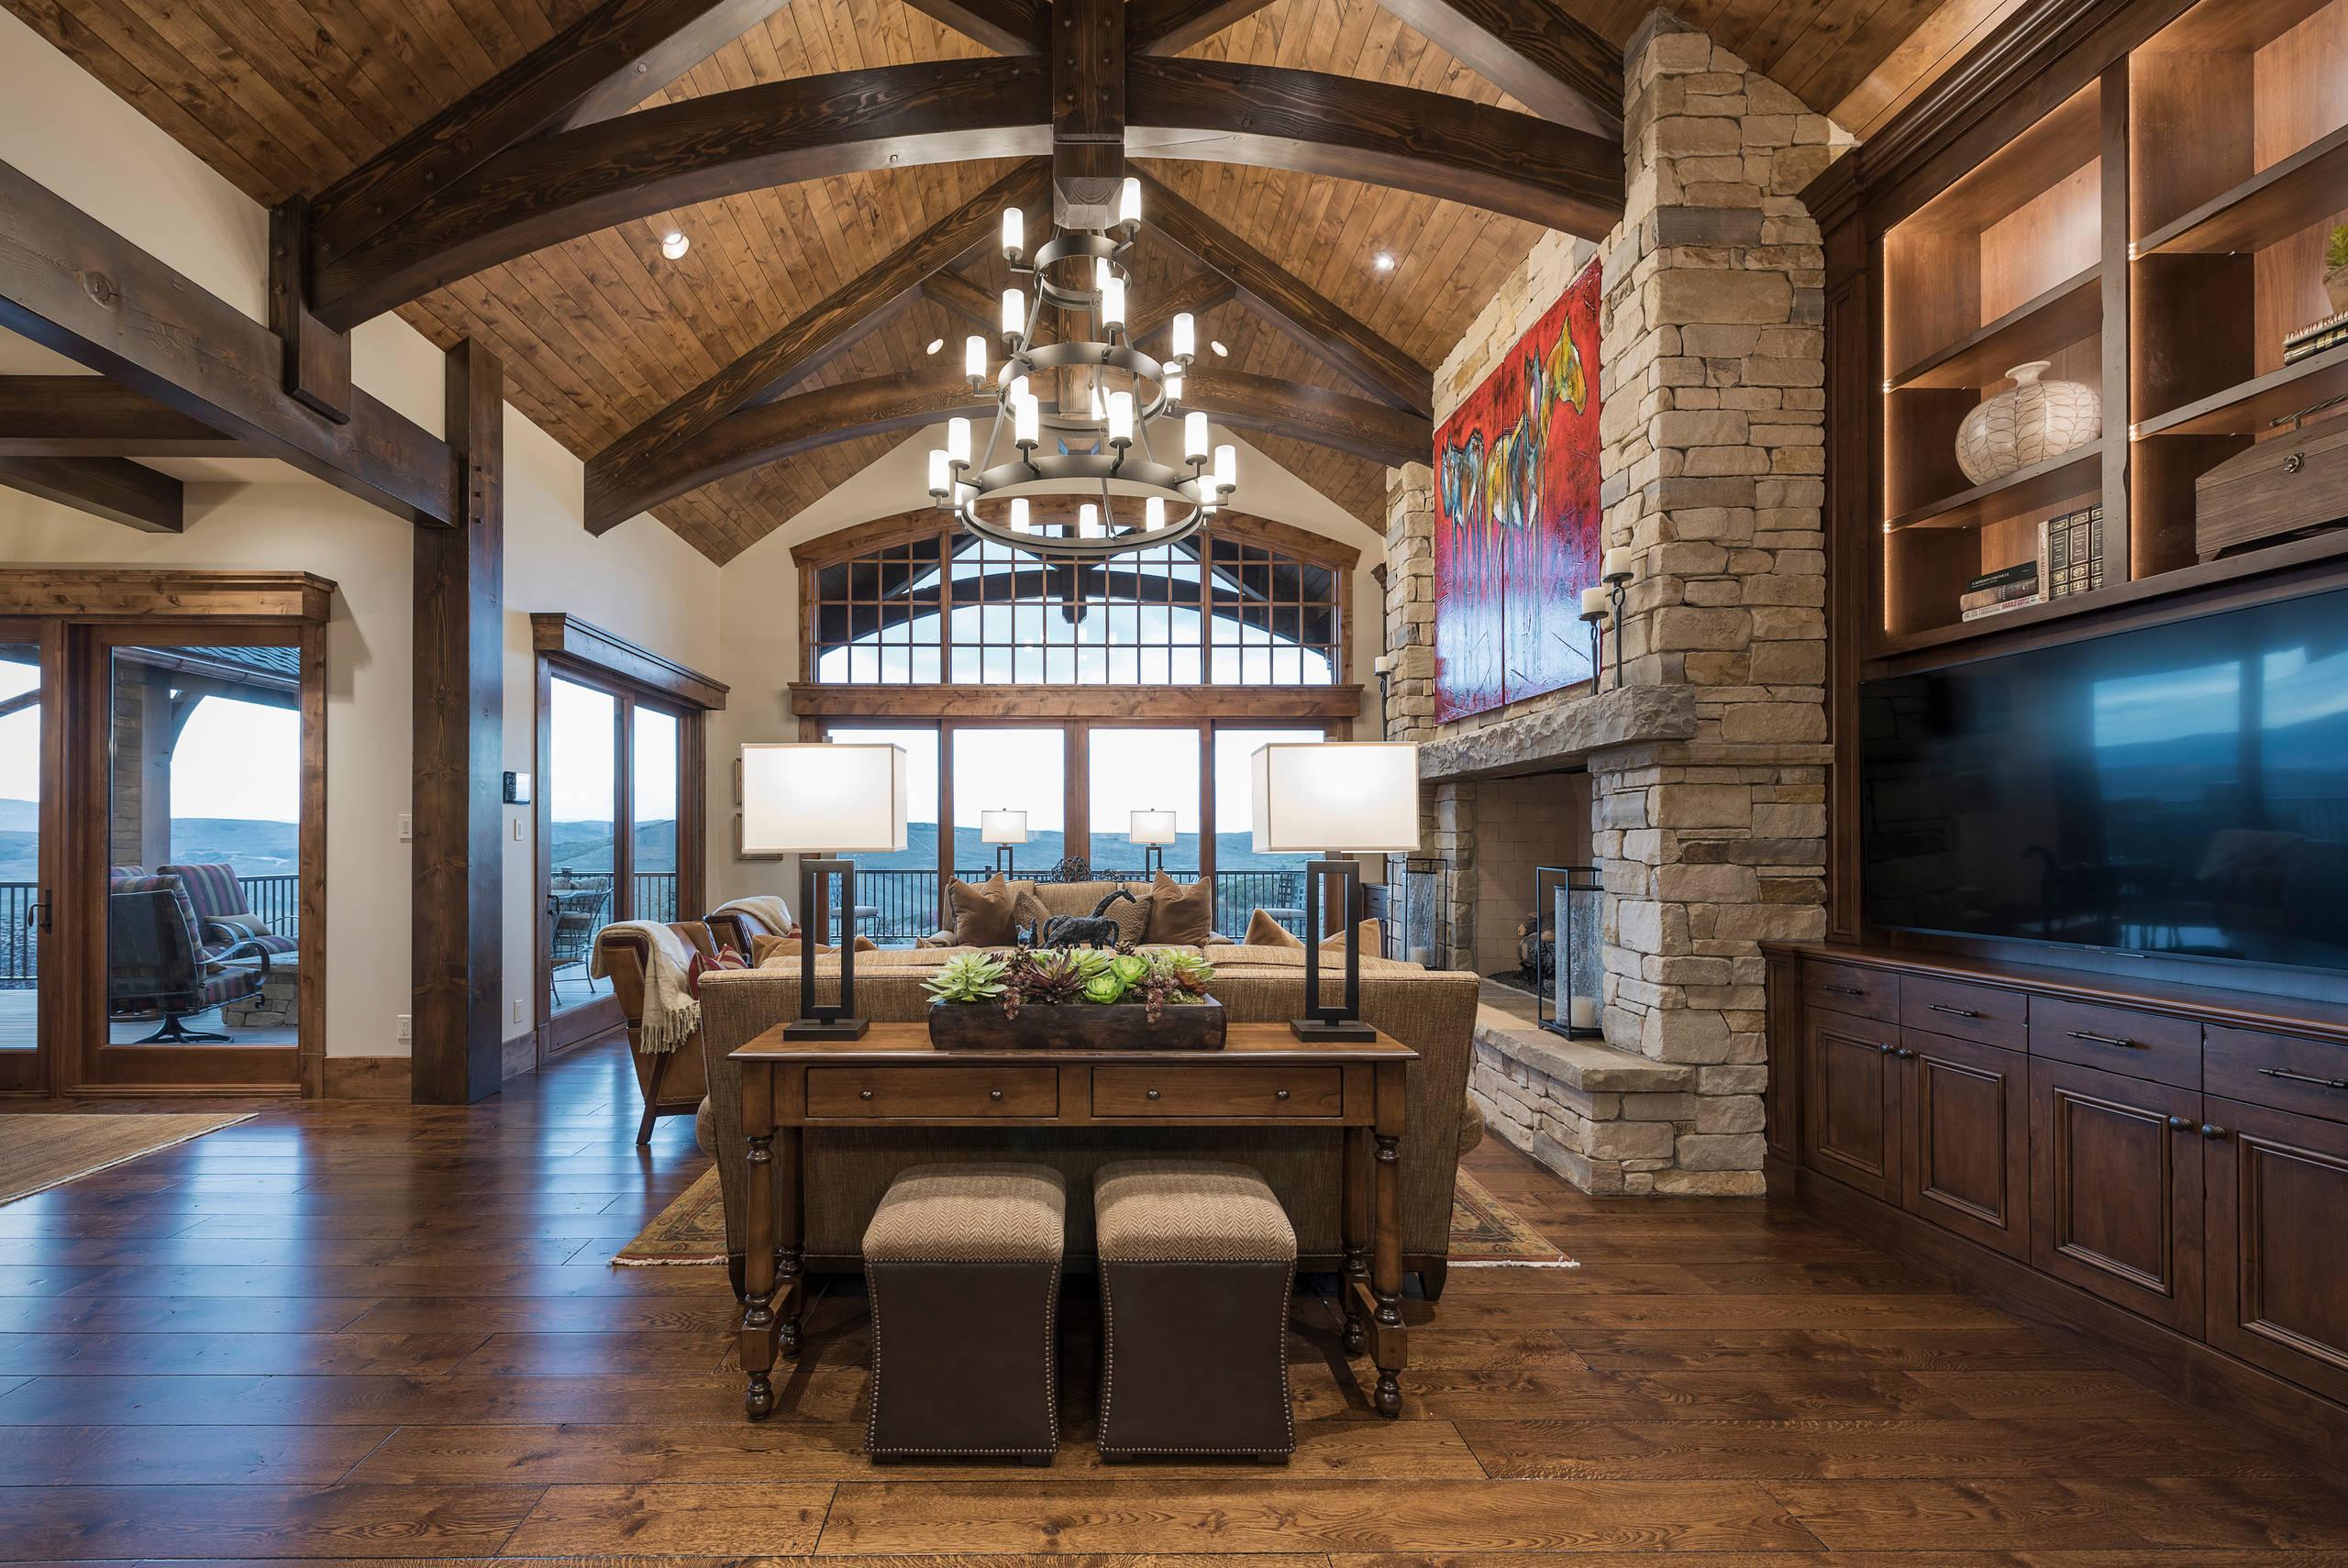 2016 Park City Area Showcase of Homes - Promontory, Utah